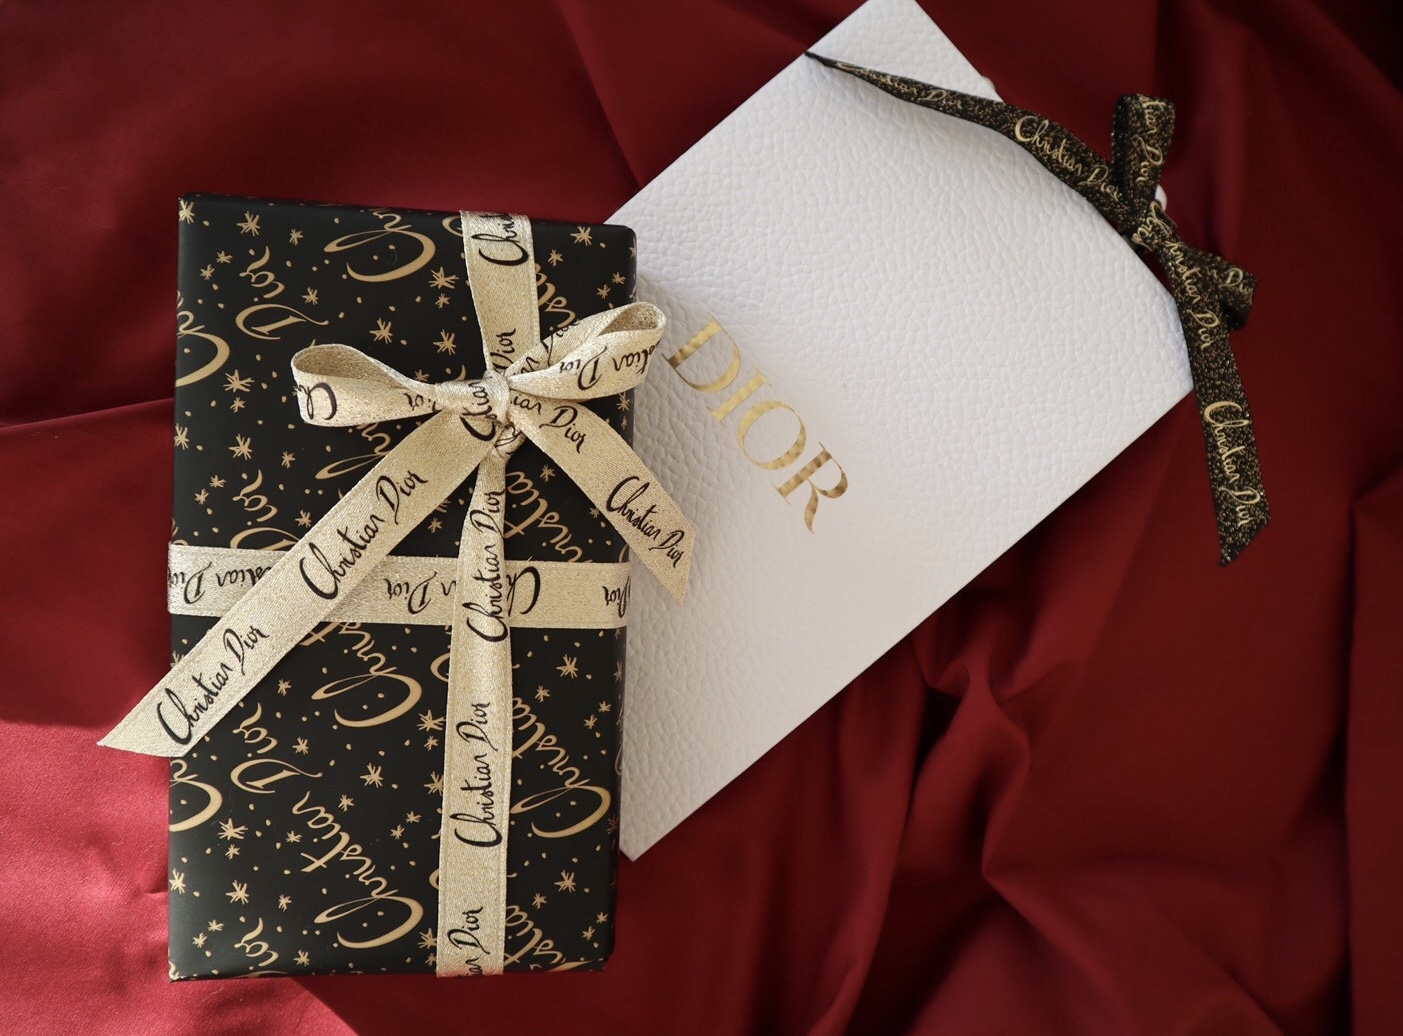 【Dior】クリスマスコフレ2020♡限定パレットが可愛すぎる!!!_1